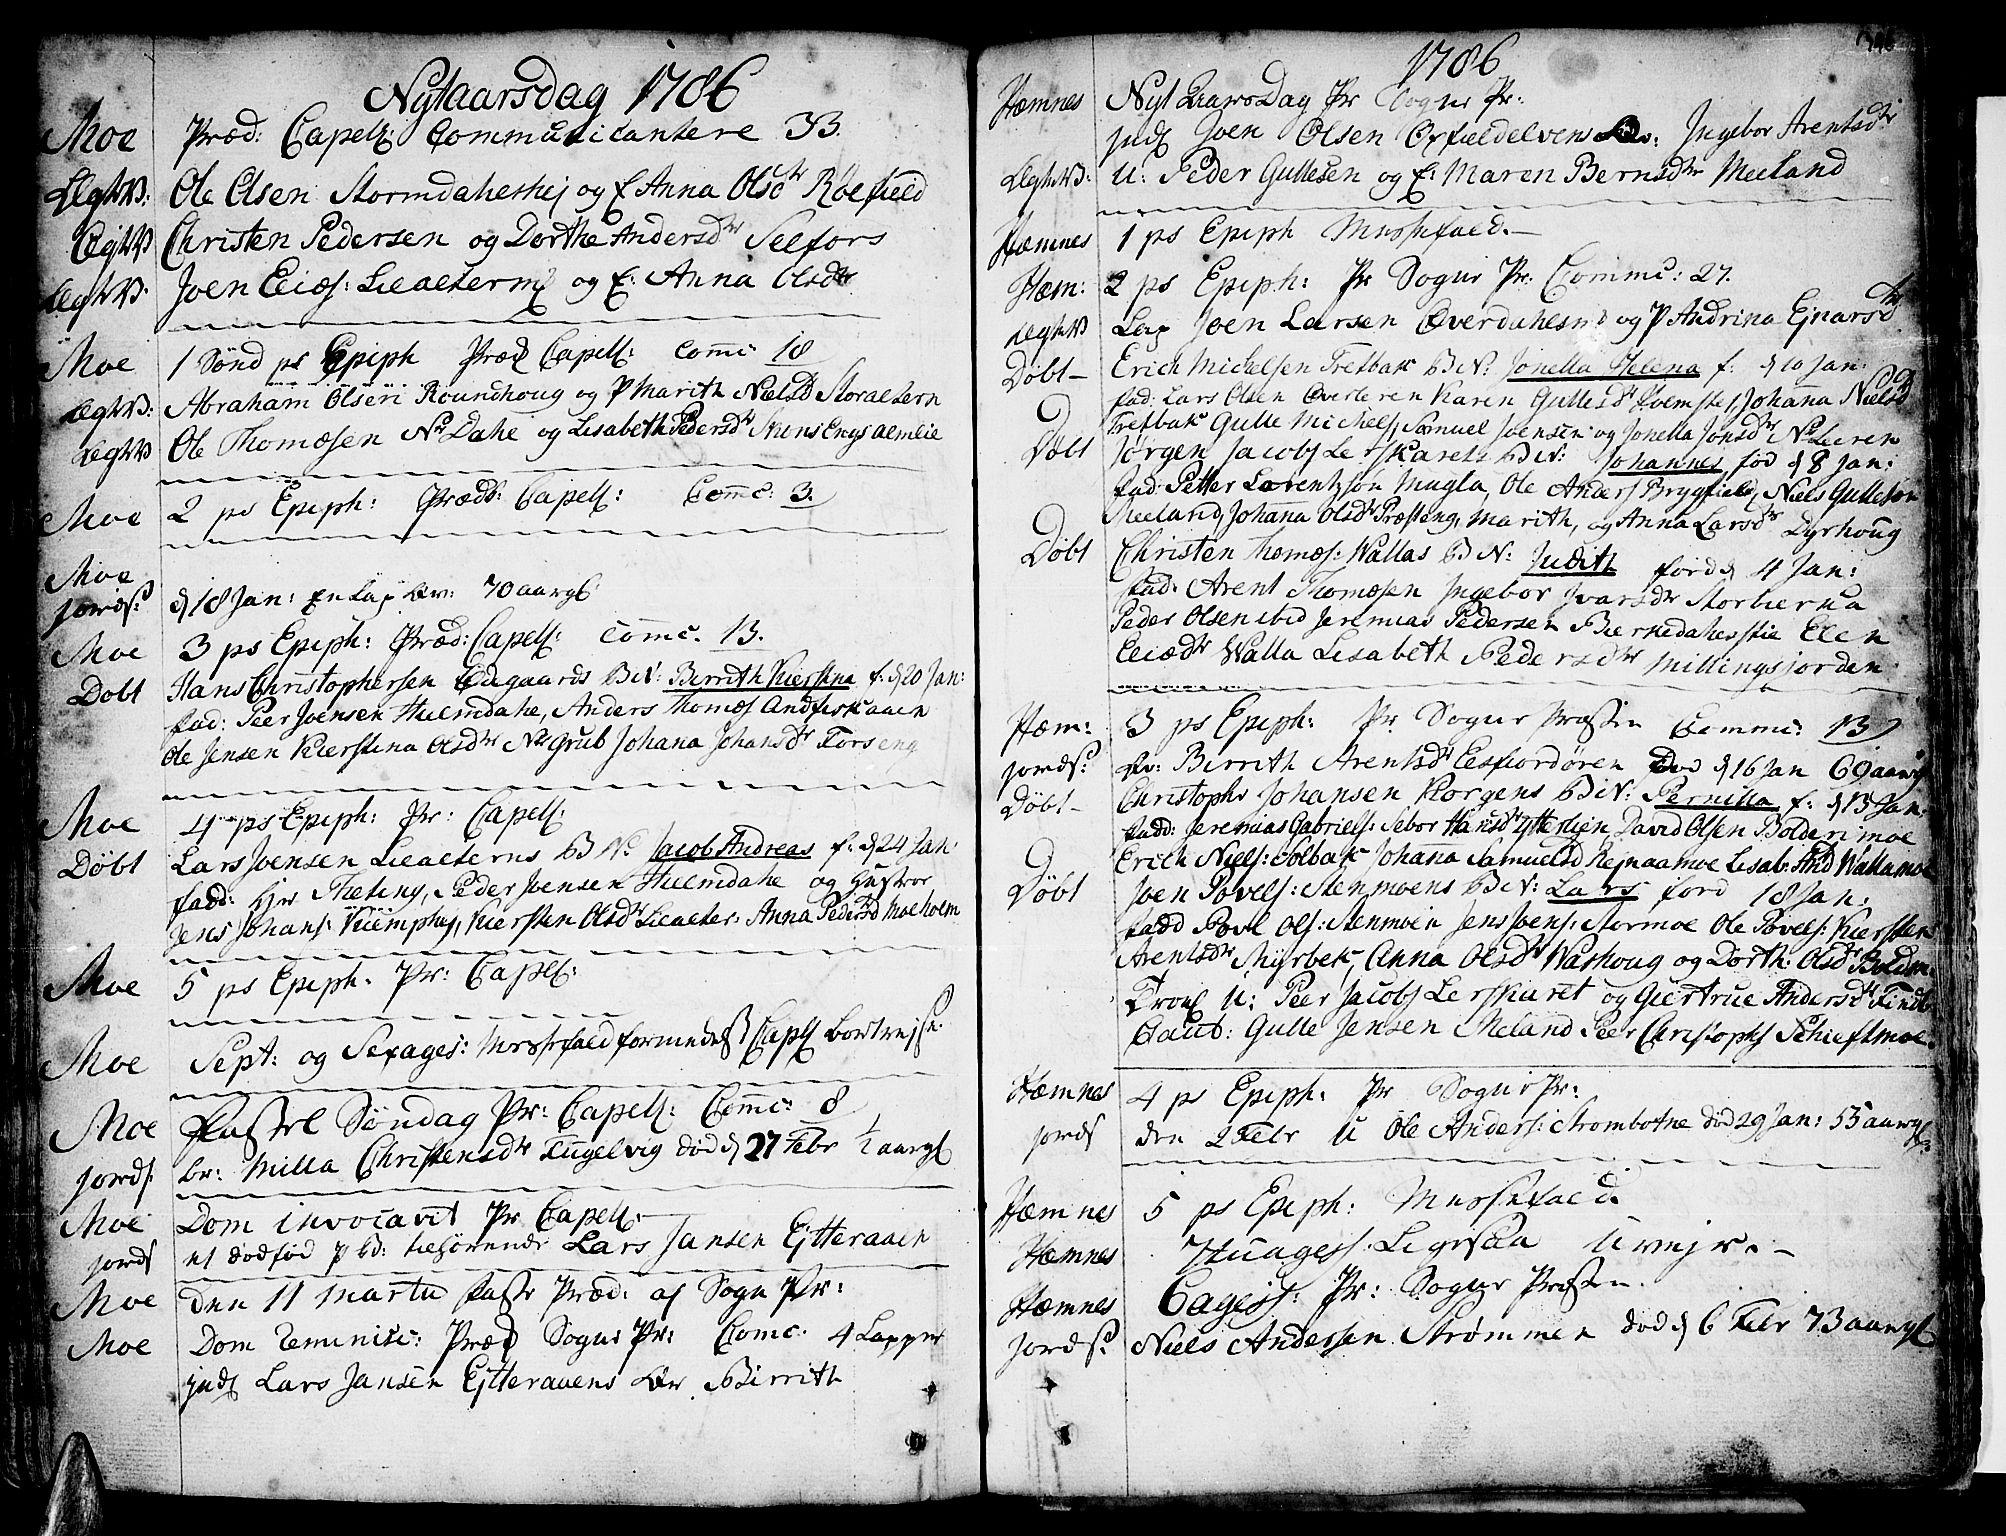 SAT, Ministerialprotokoller, klokkerbøker og fødselsregistre - Nordland, 825/L0348: Ministerialbok nr. 825A04, 1752-1788, s. 346